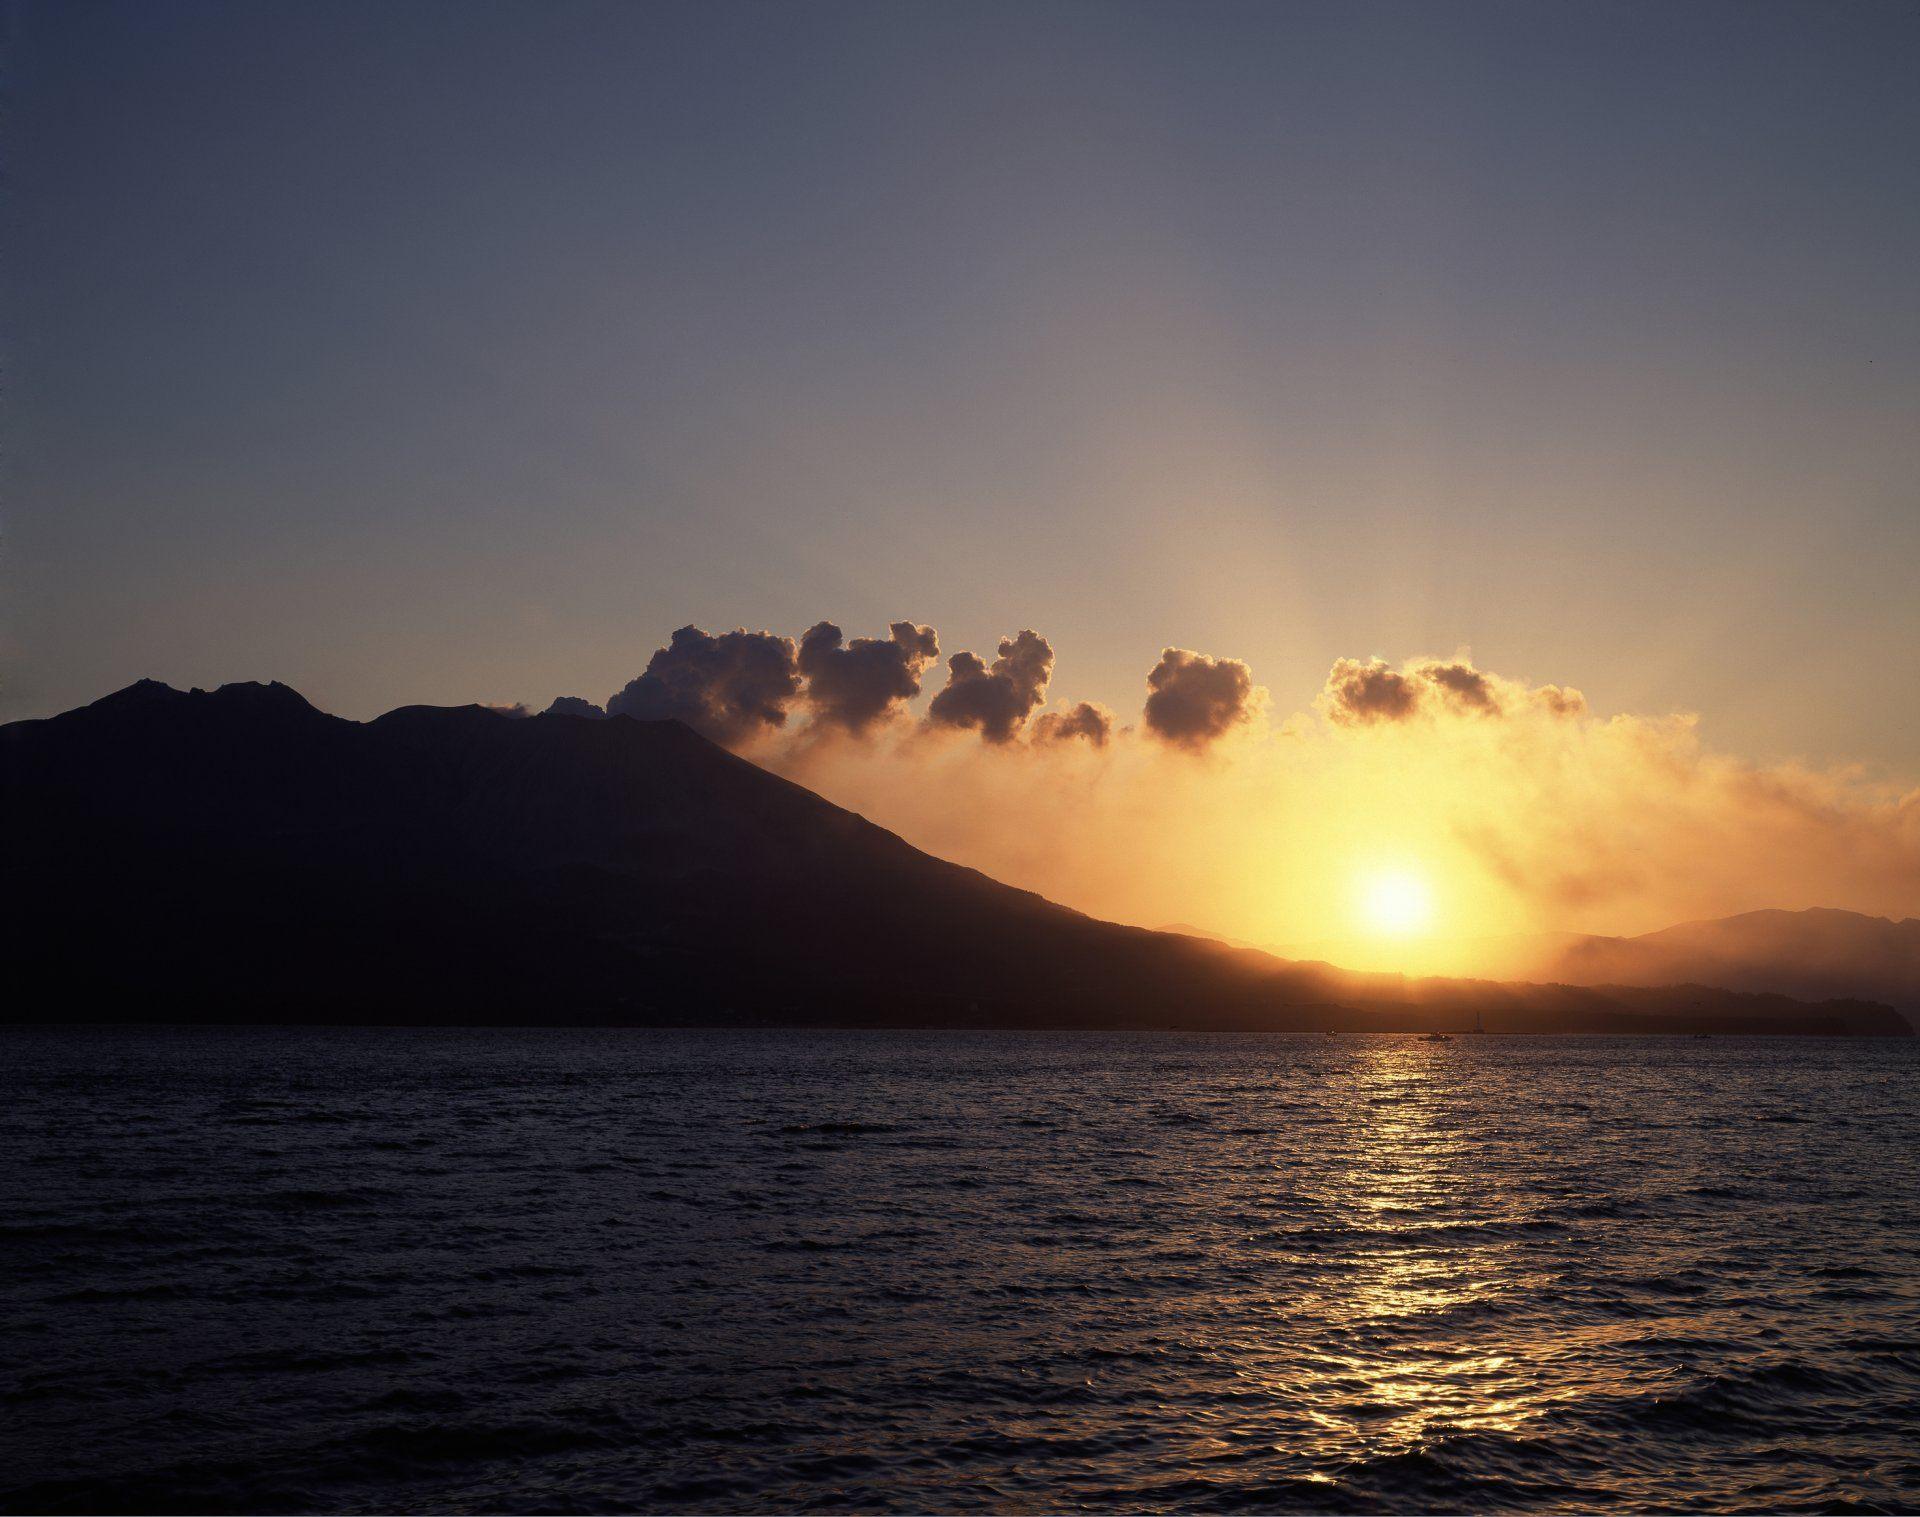 Early Morning, Morning Glow